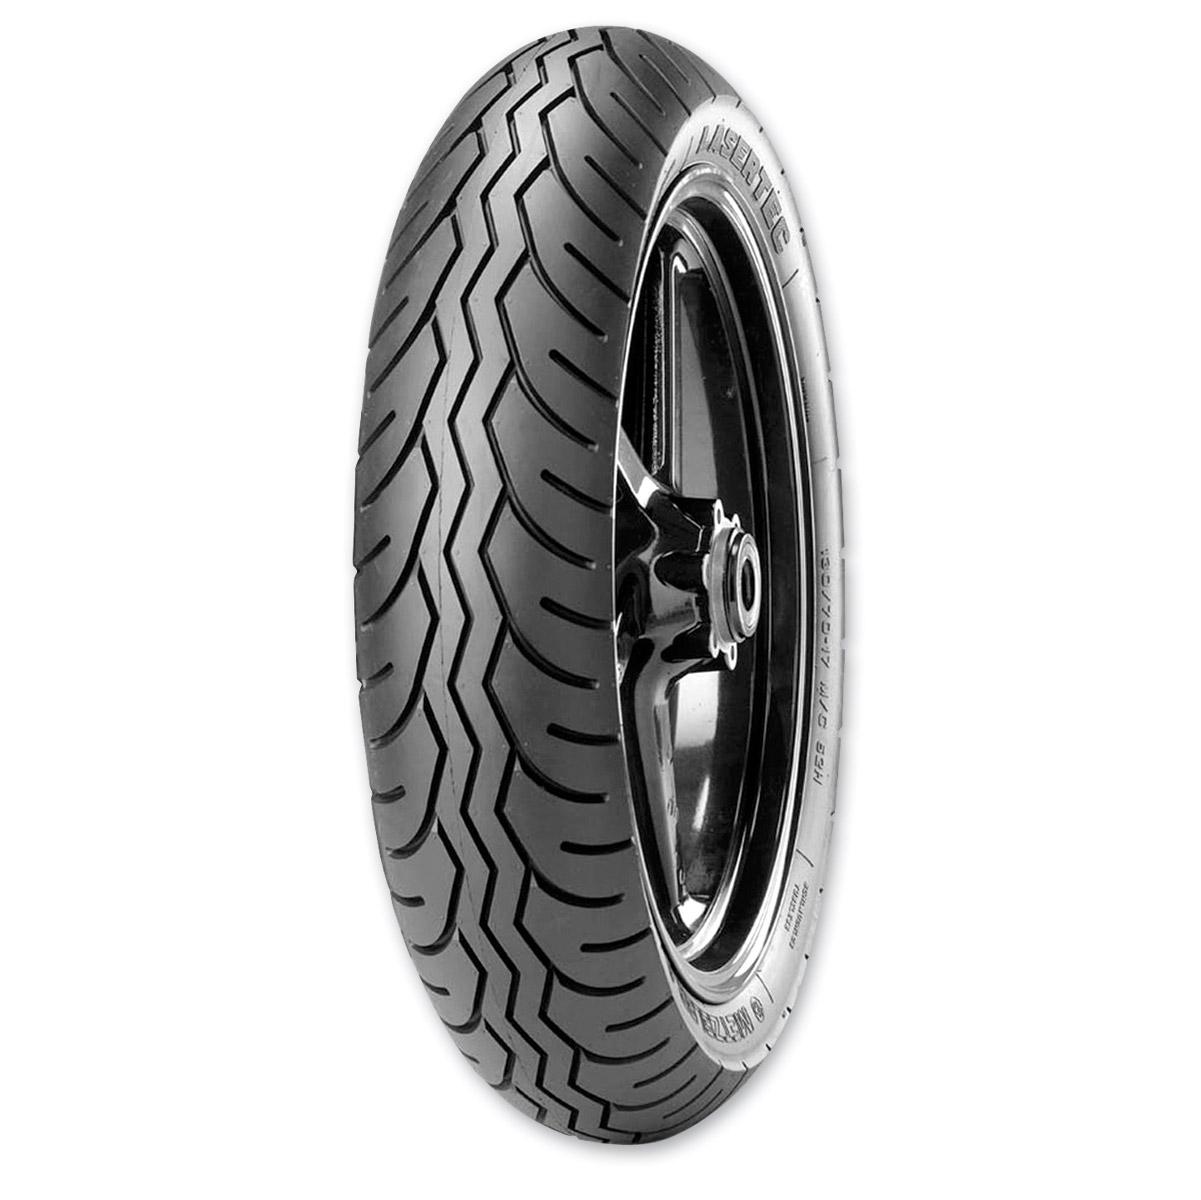 Metzeler Lasertec 160/70B17 Rear Tire